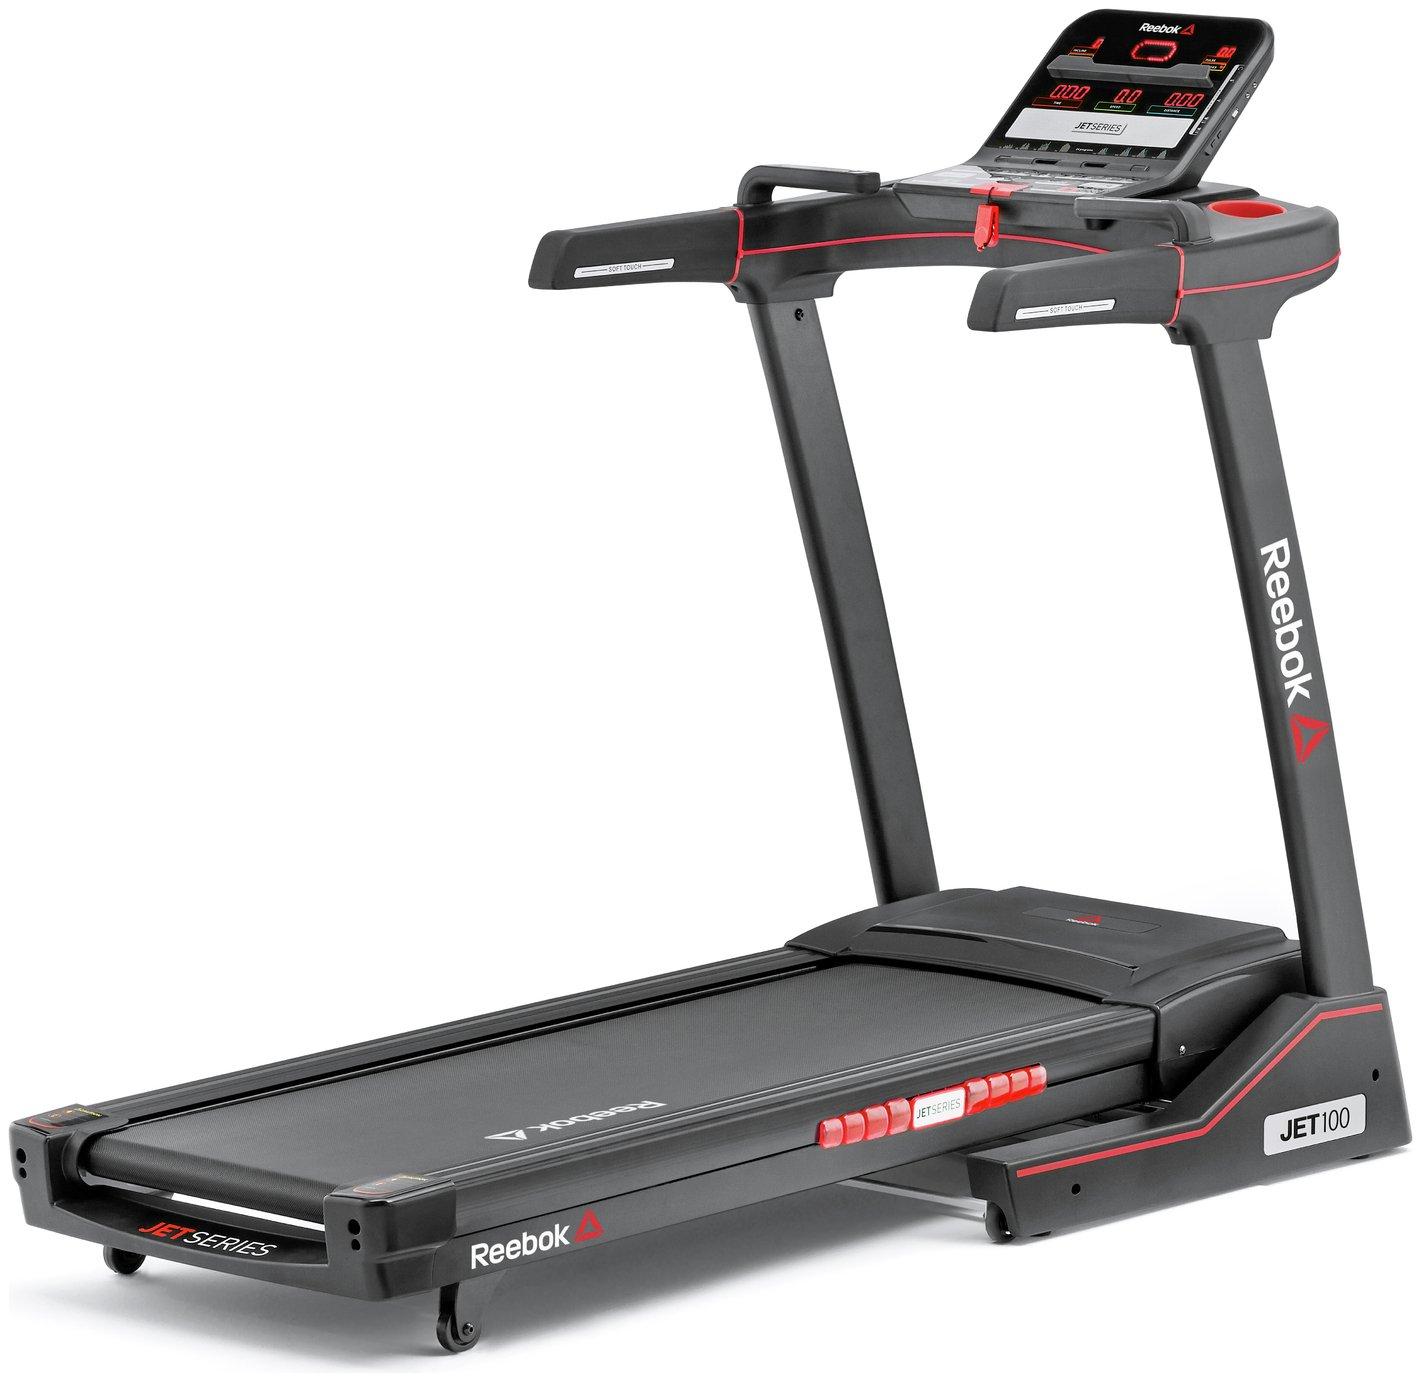 Reebok Jet 100 Treadmill £599.99 + £6.95 delivery @ Argos